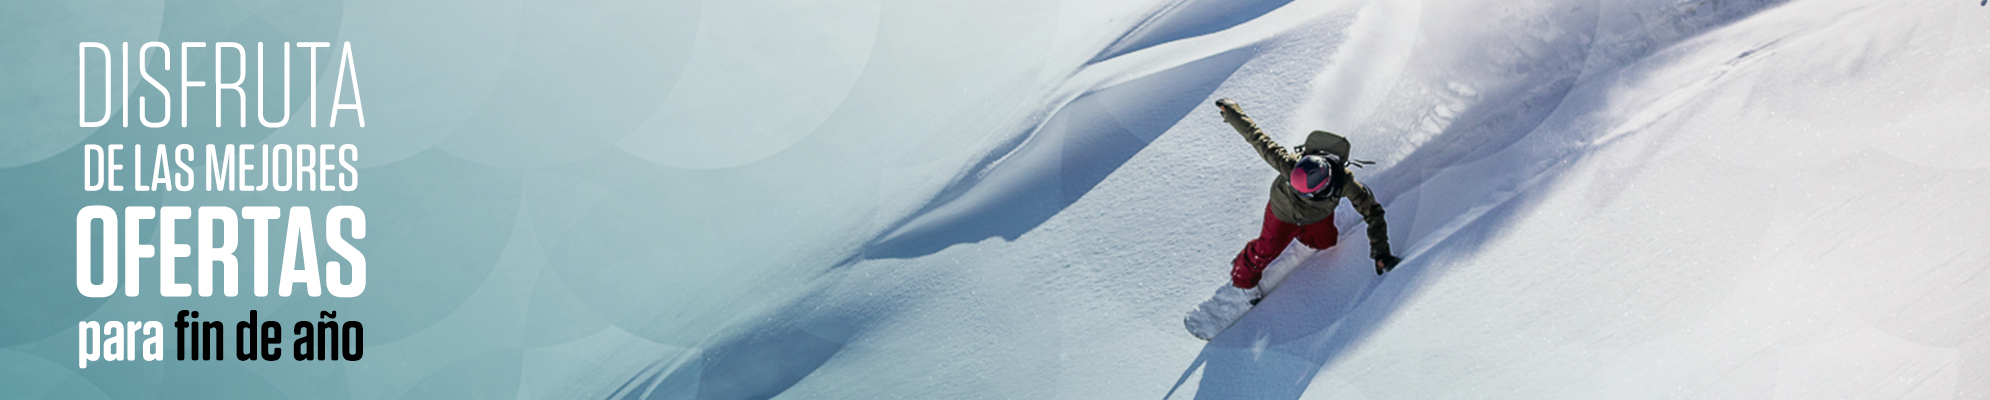 oferta esqui fin de año aramon formigal panticosa cerler